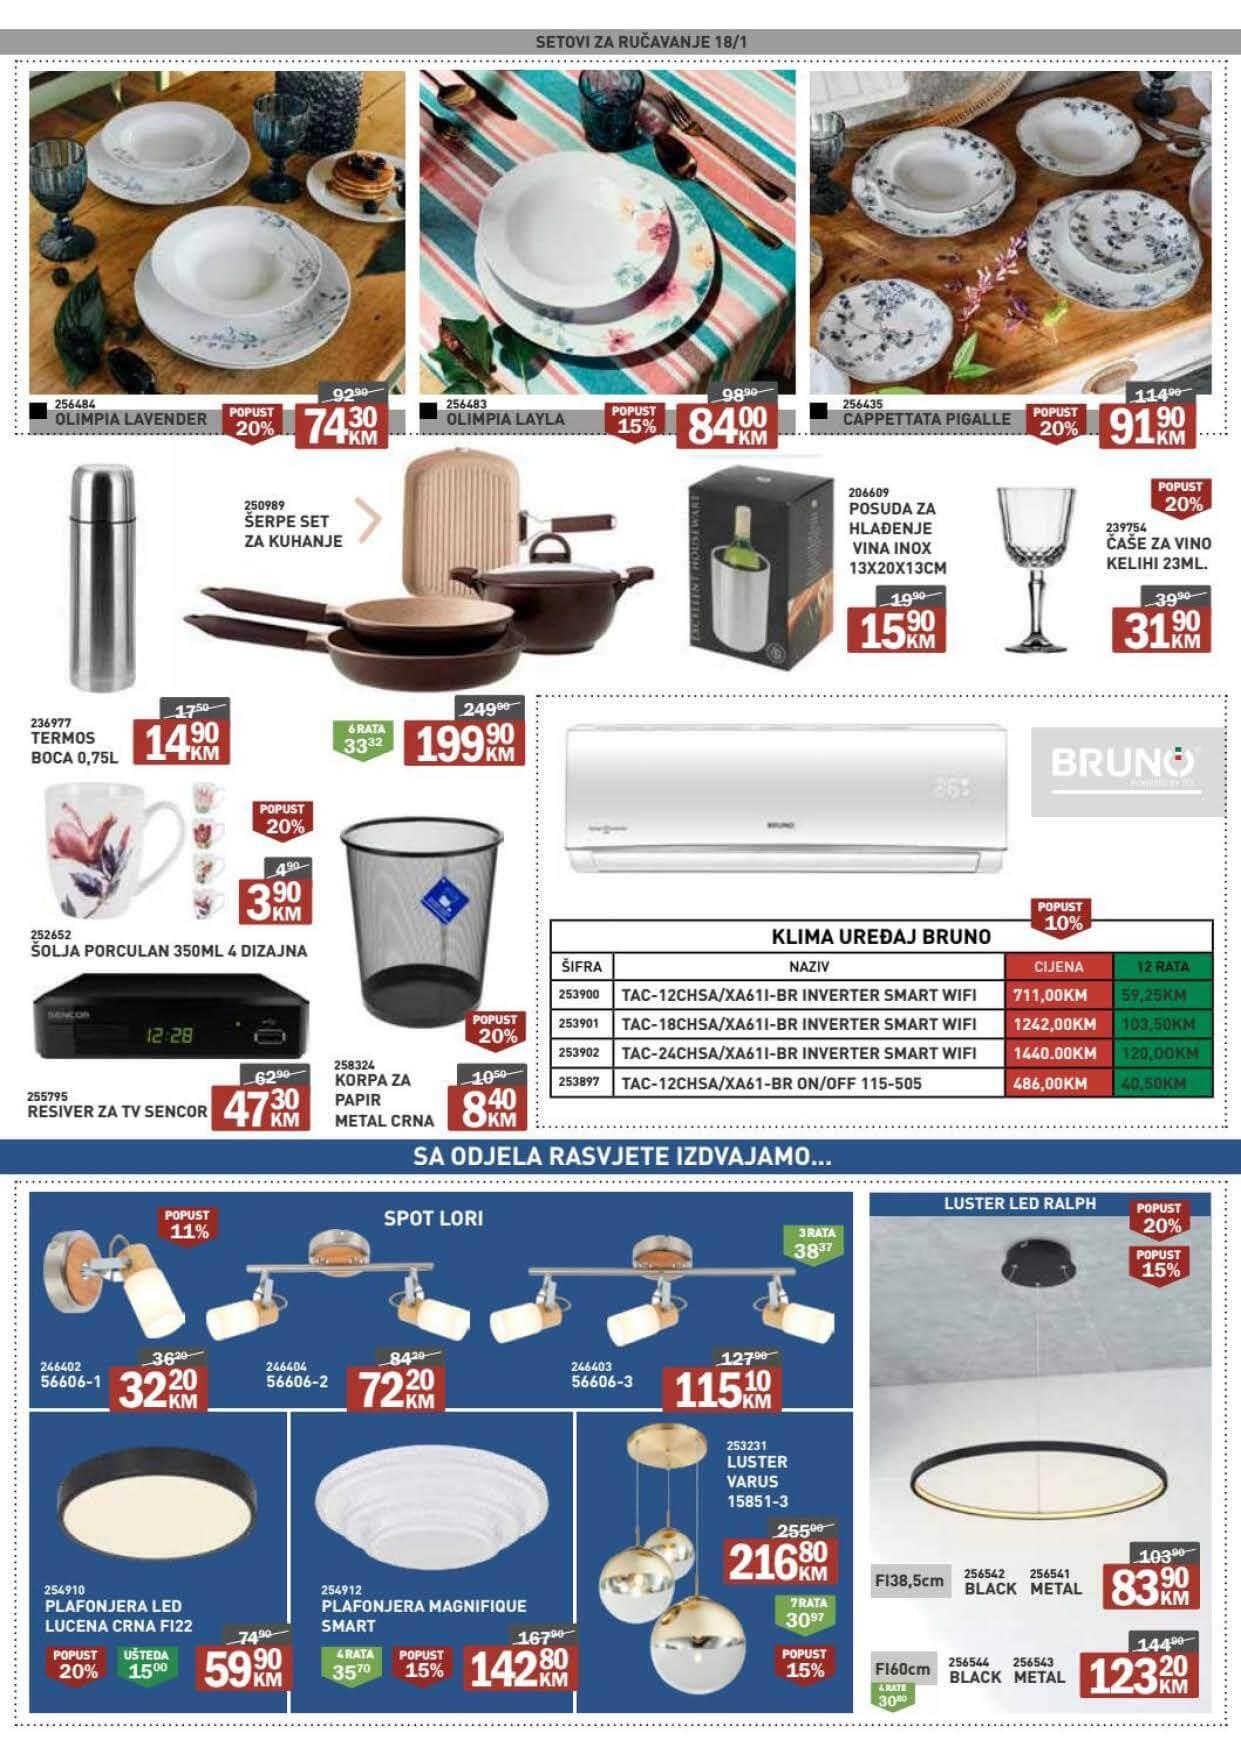 VERNO AGROMEHANIKA Akcijski katalog AVGUST 2021 1.8. 31.8.2021. Page 15